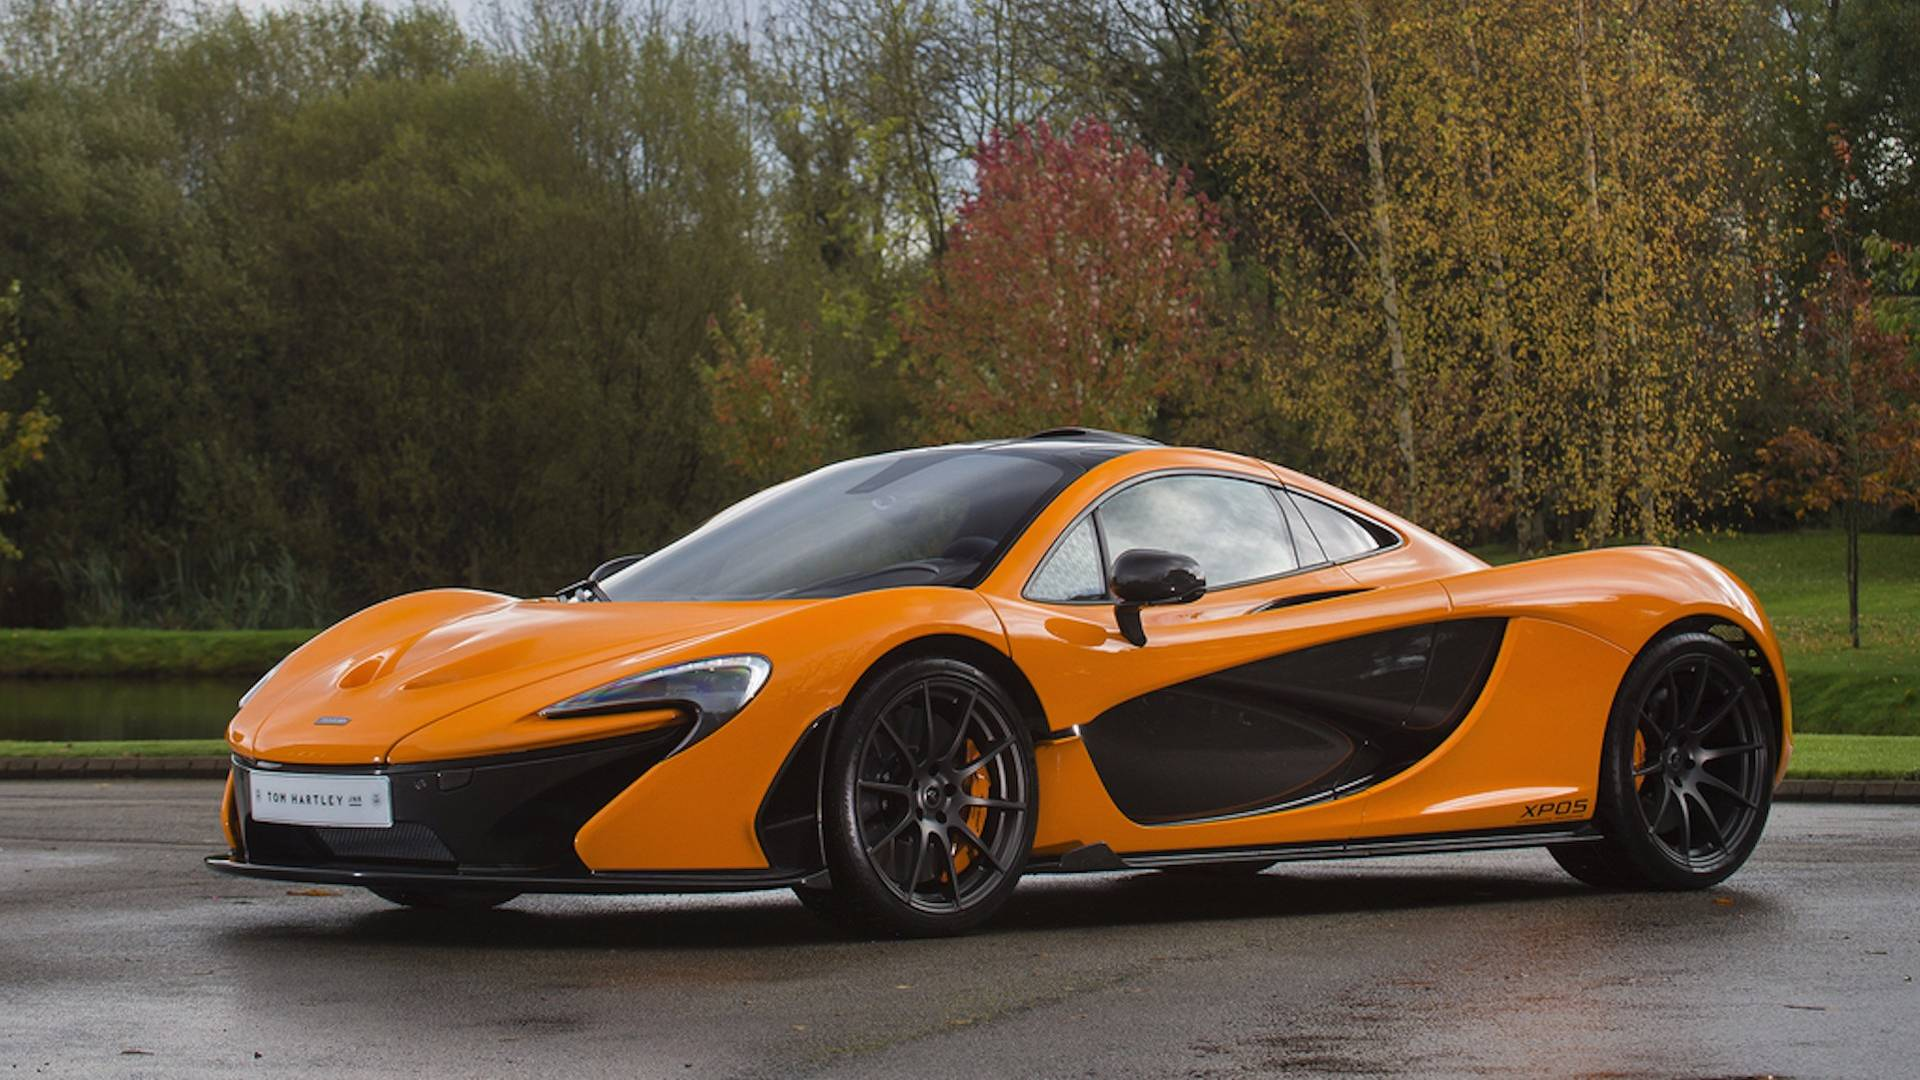 McLaren_P1_Experimental_Prototype_03